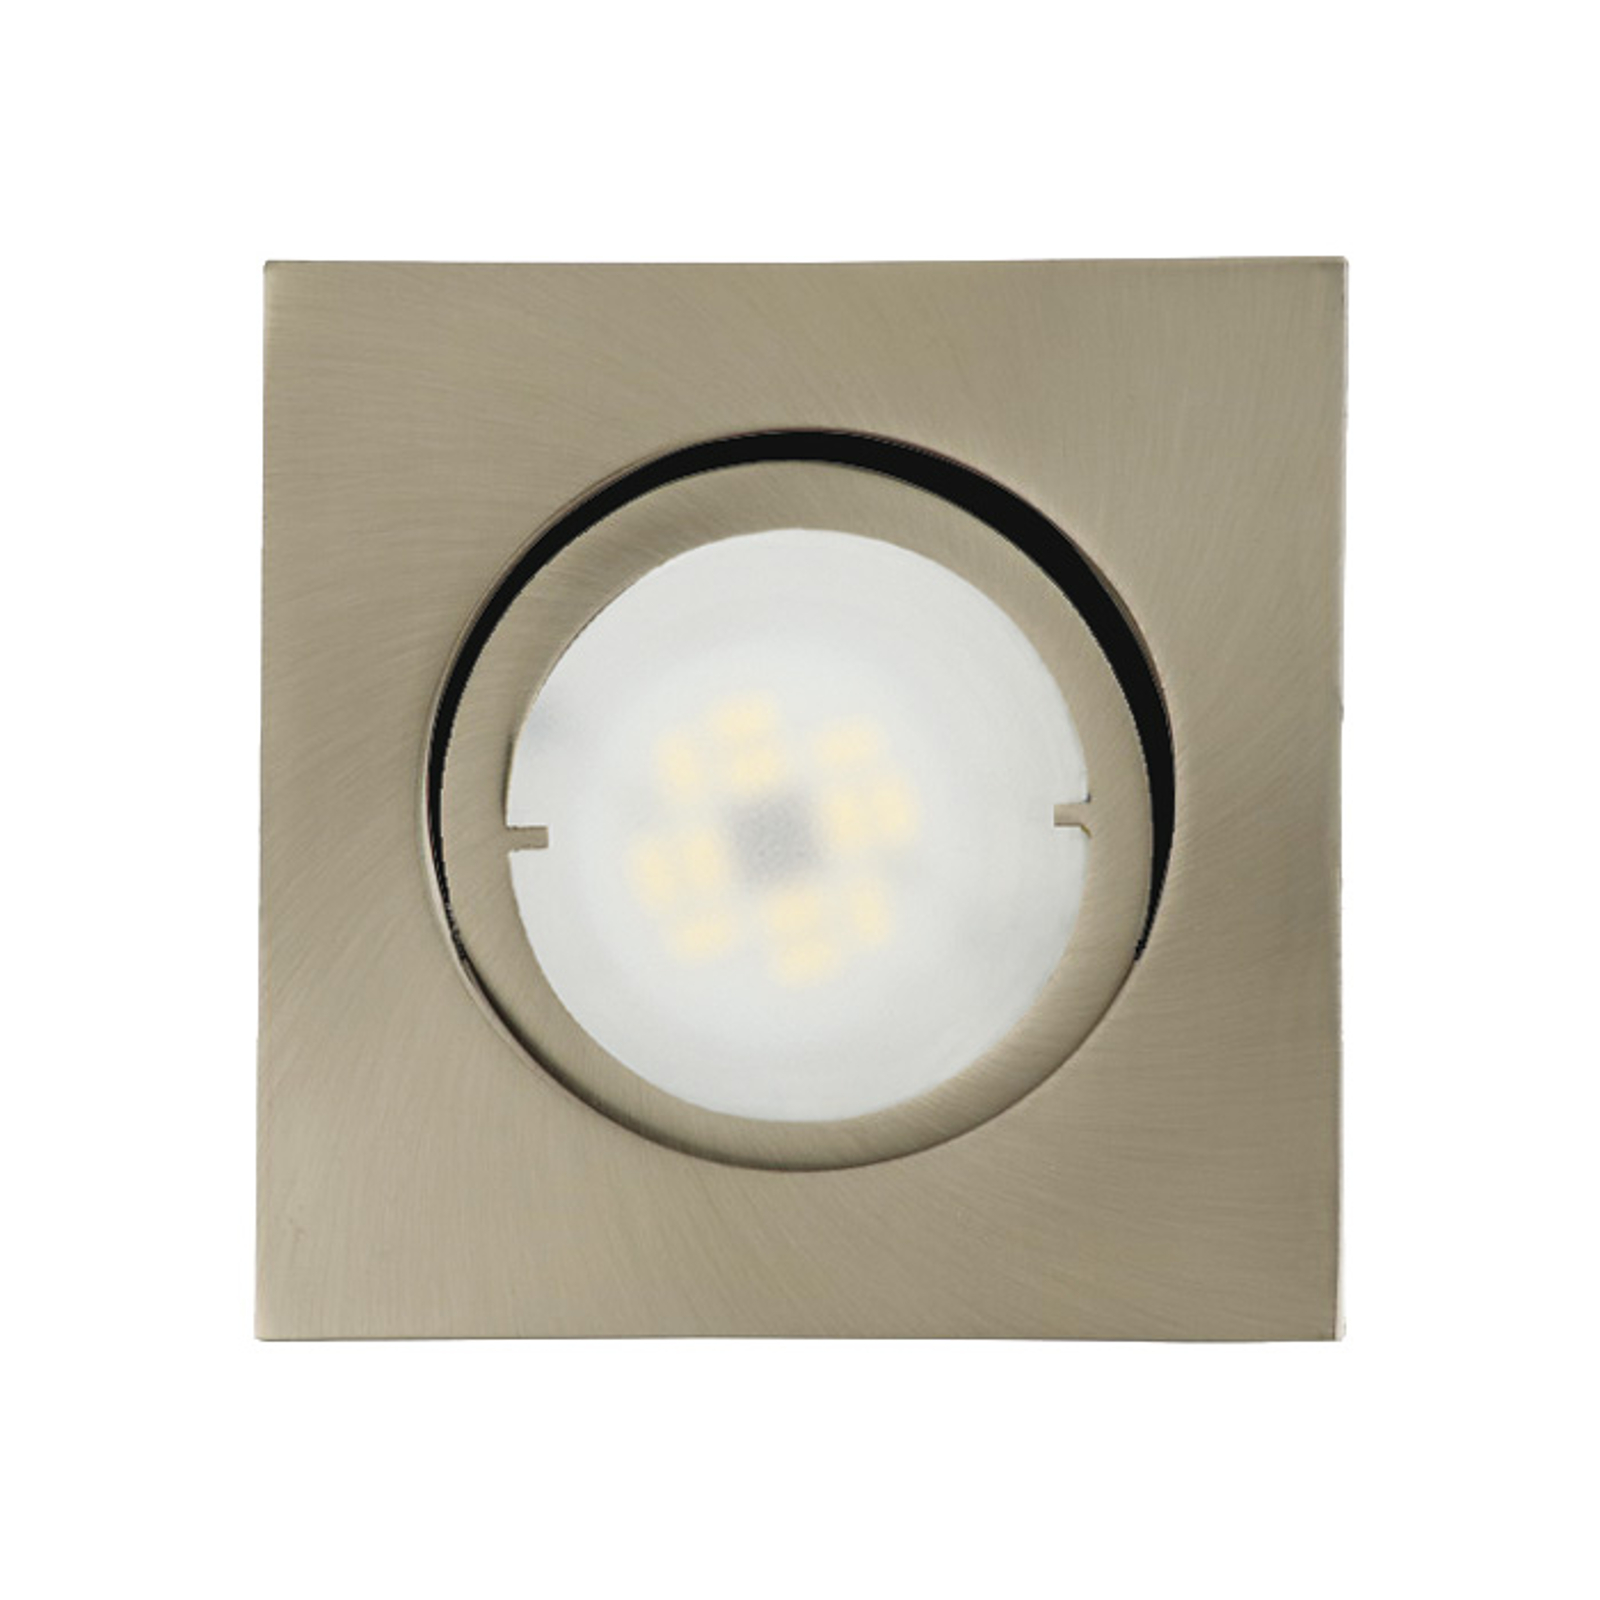 Joanie - lámpara empotrada LED, hierro cepillado